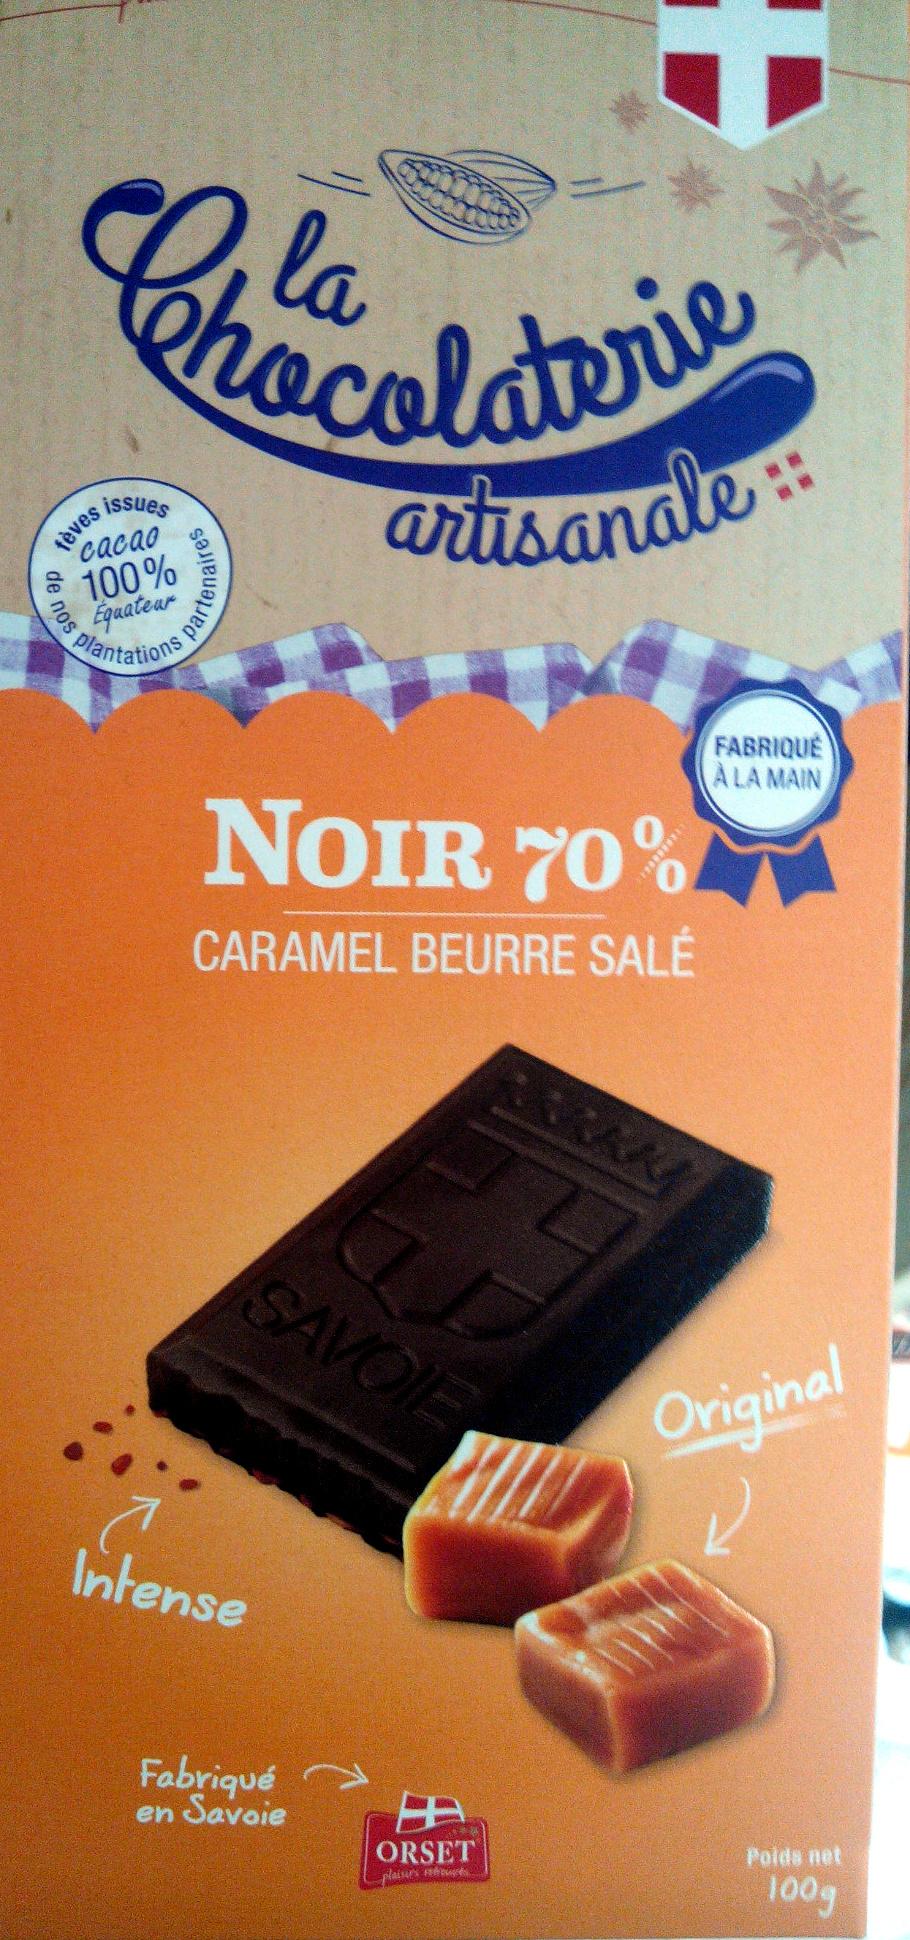 Noir 70% caramel beurre salé - Product - fr